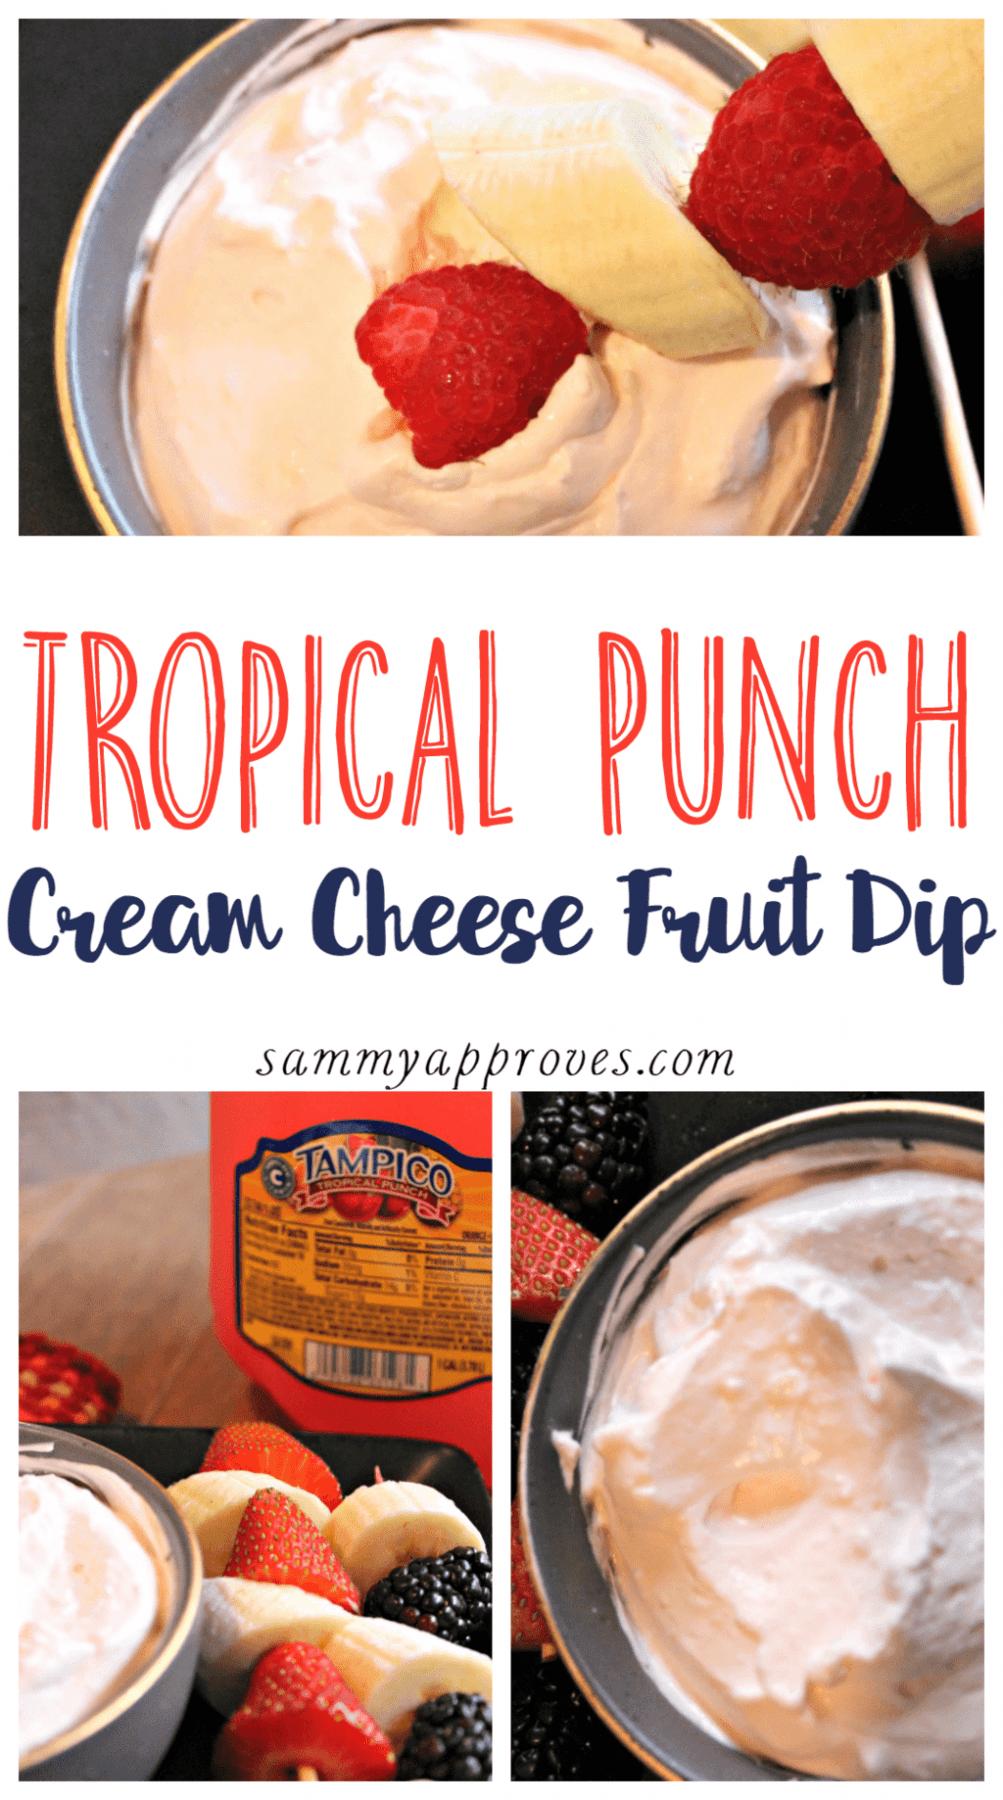 Tropical Punch Cream Cheese Fruit Dip